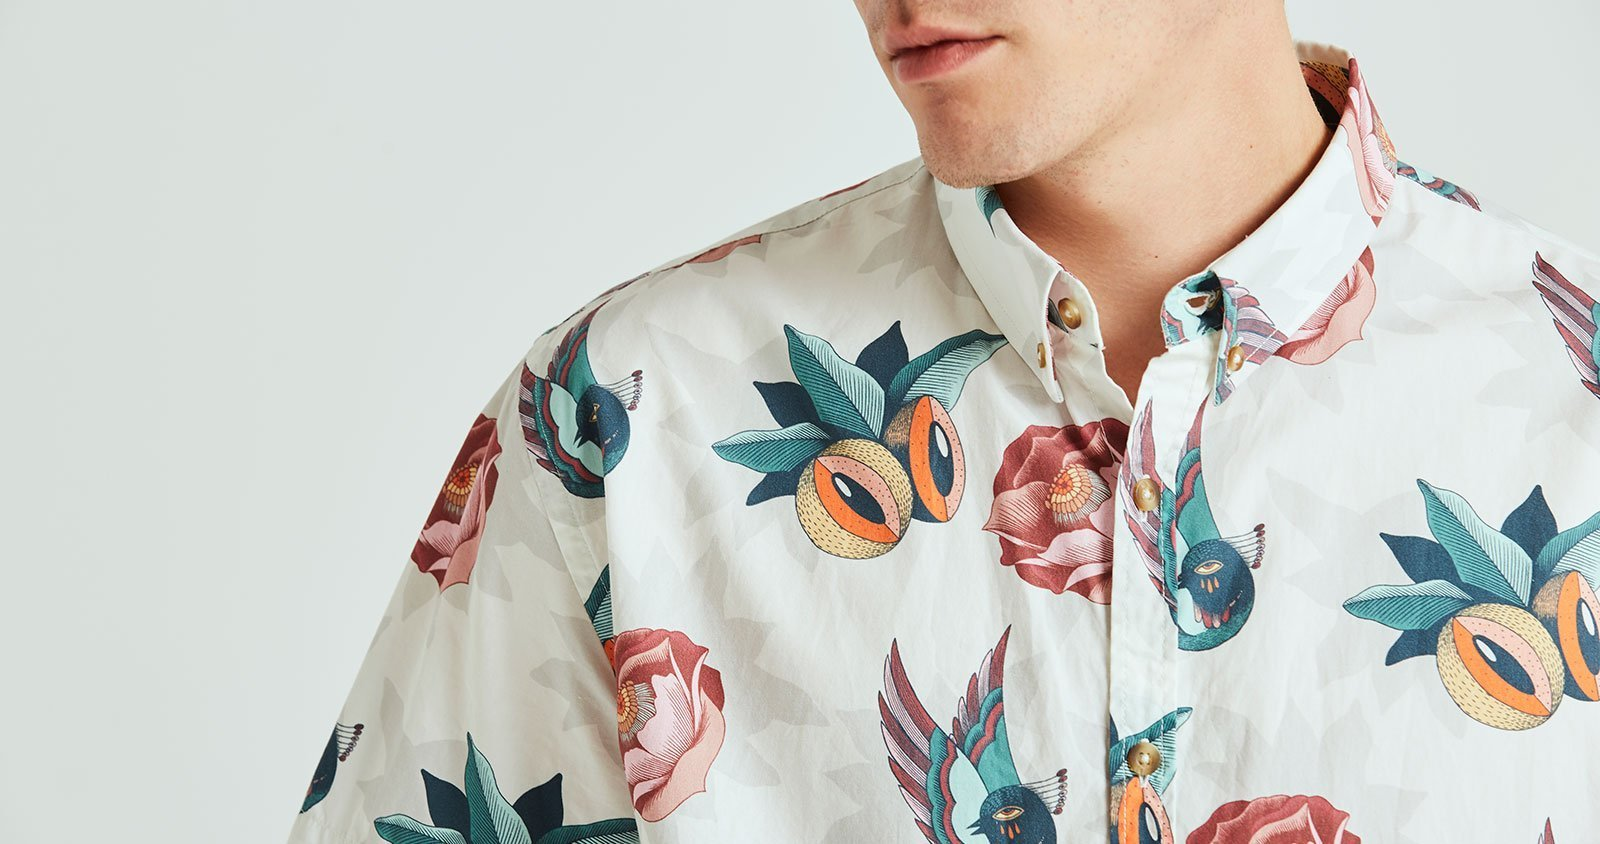 Boa Mistura Tiwel clothing shirt